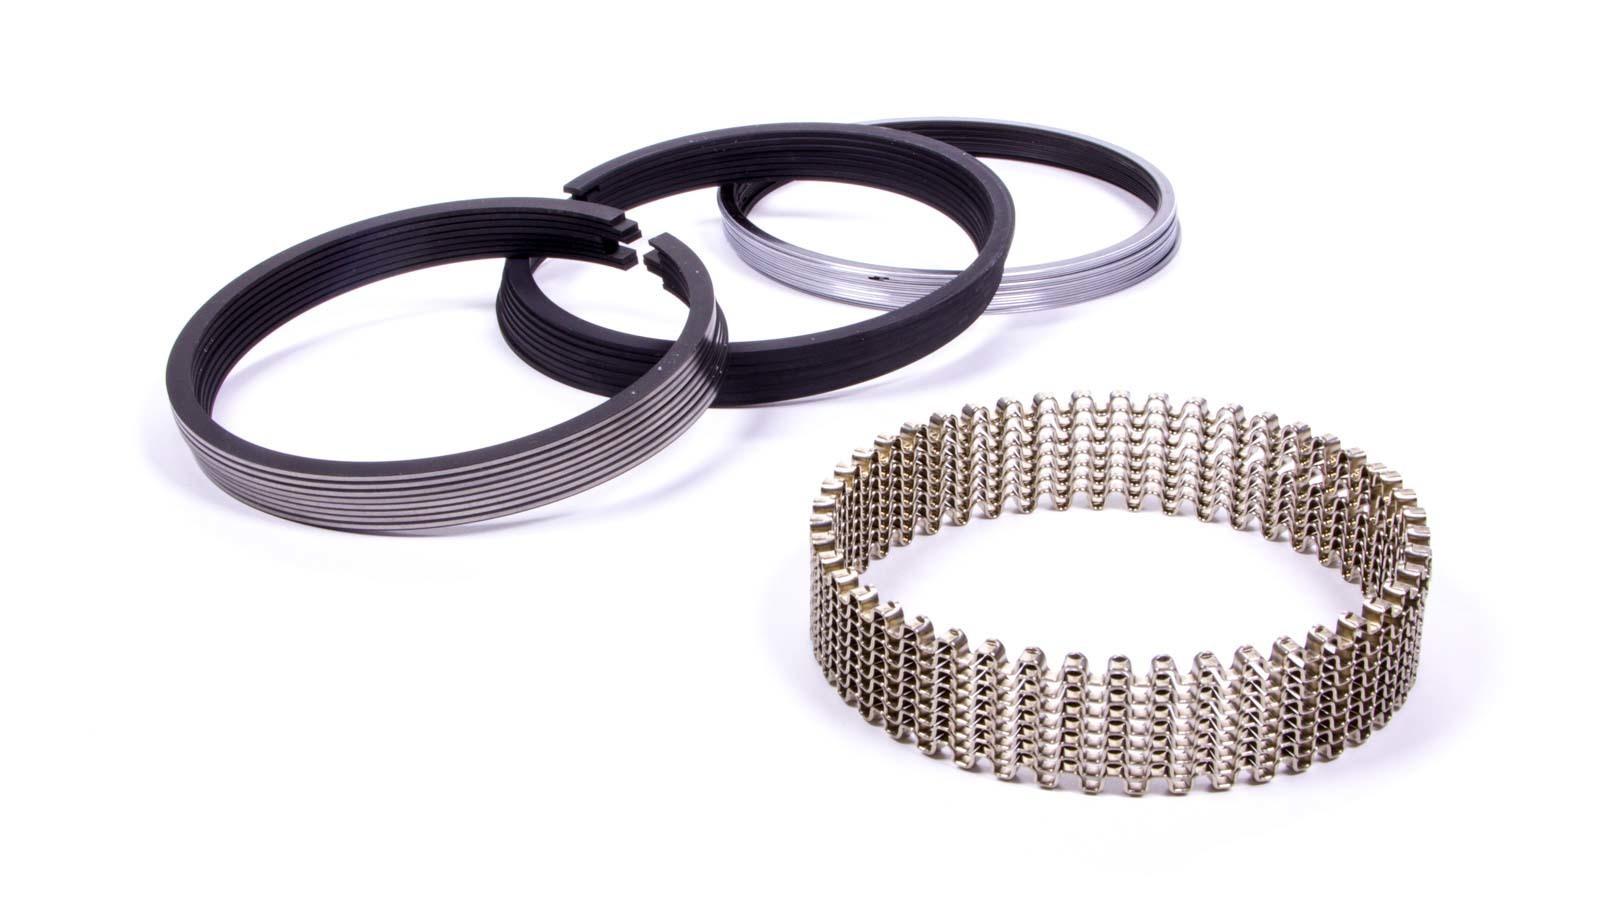 Je Pistons Piston Ring Set 4.030 Moly 1/16 1/16 3/16